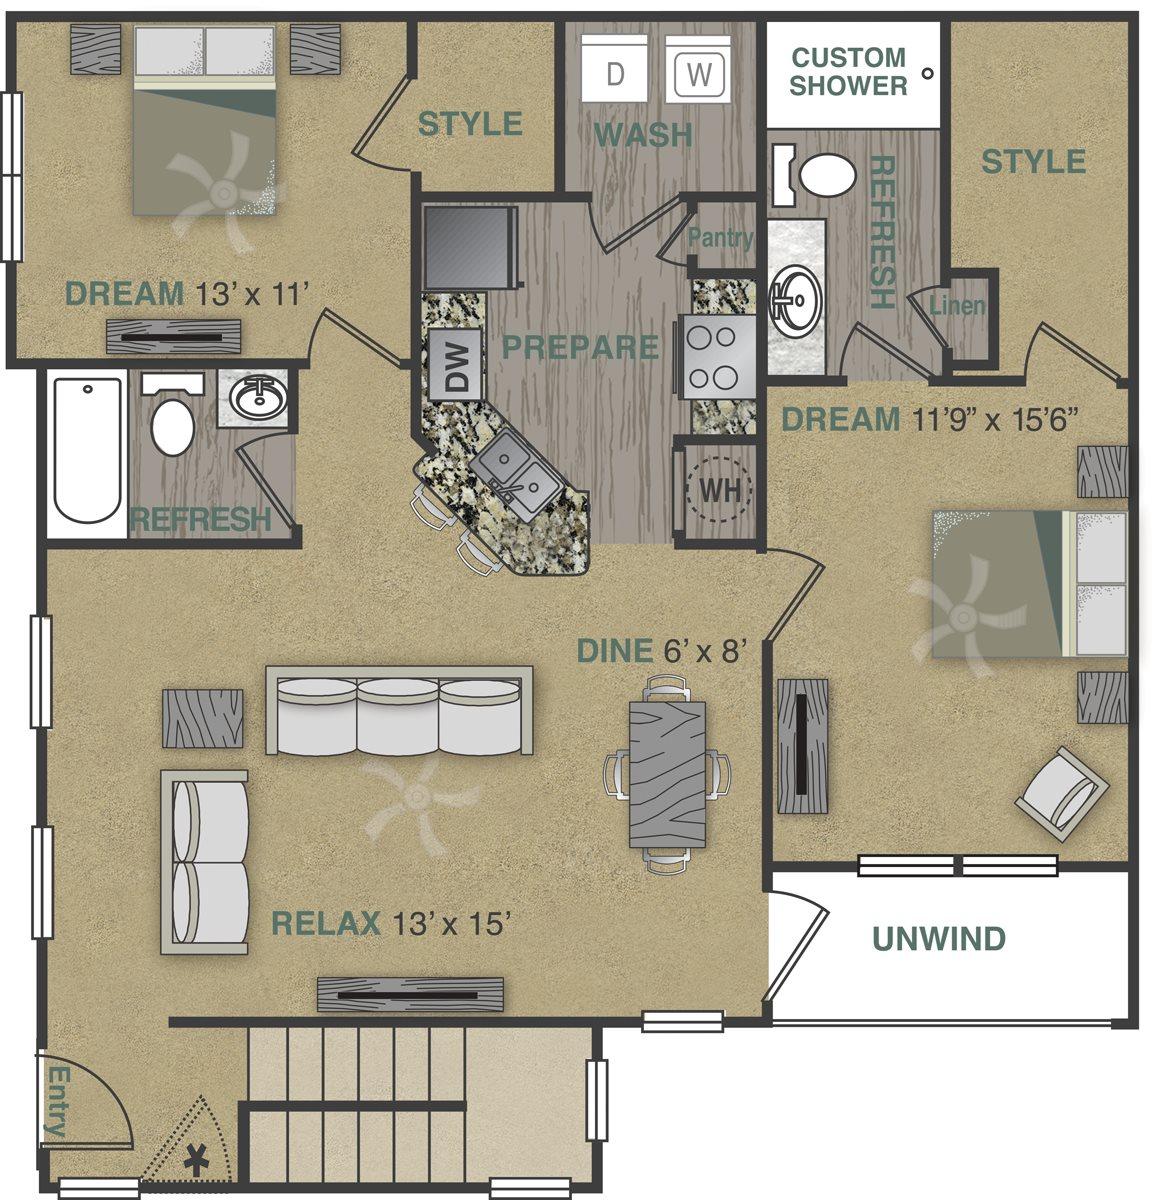 B1UGA Floor Plan 18